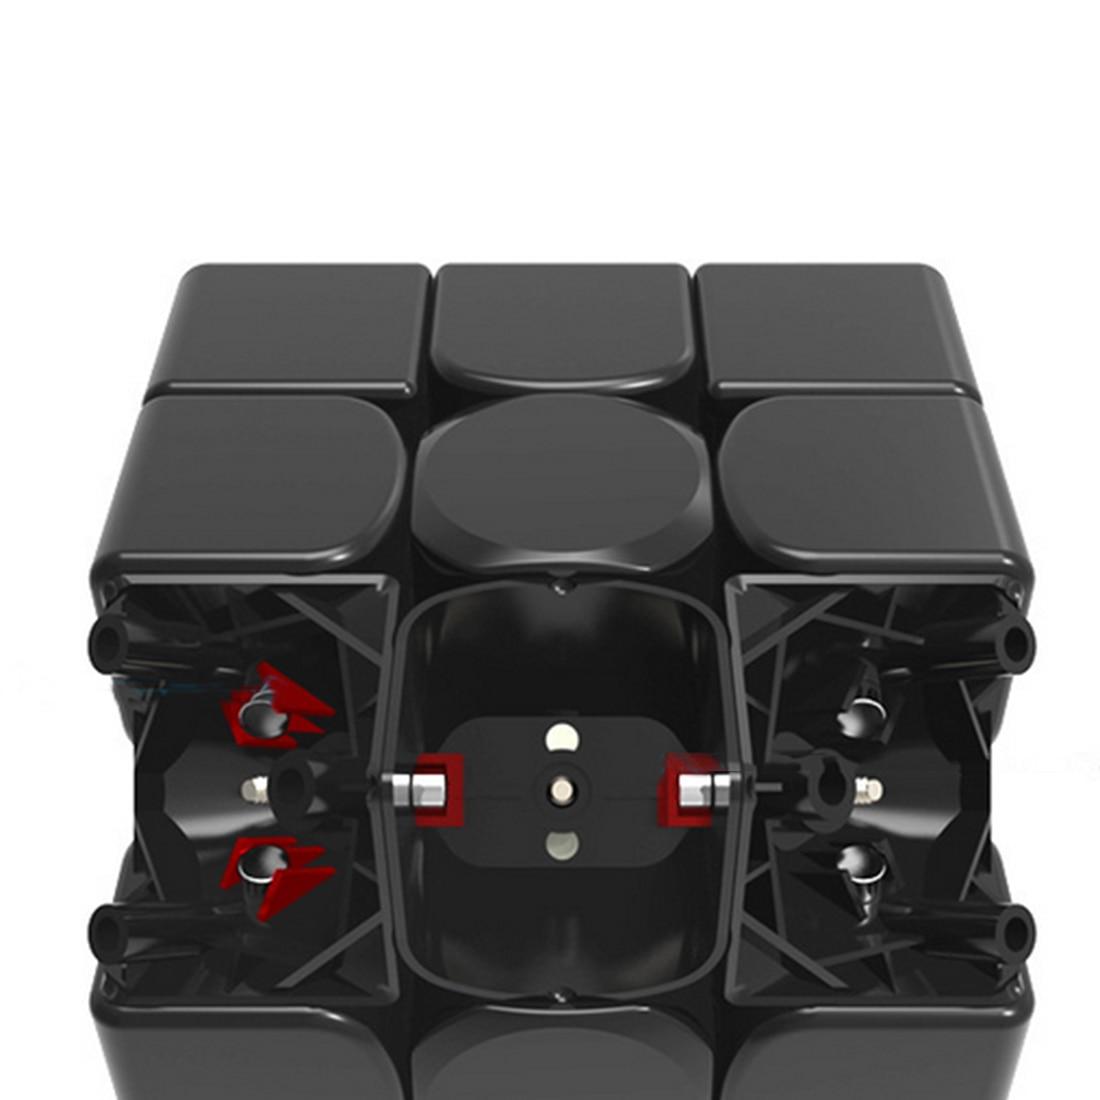 UTOYSLAND 60 pcs GAN356 Air SM Magnetic Version Speedcubing 3x3 Magic Cube for Competition - Black